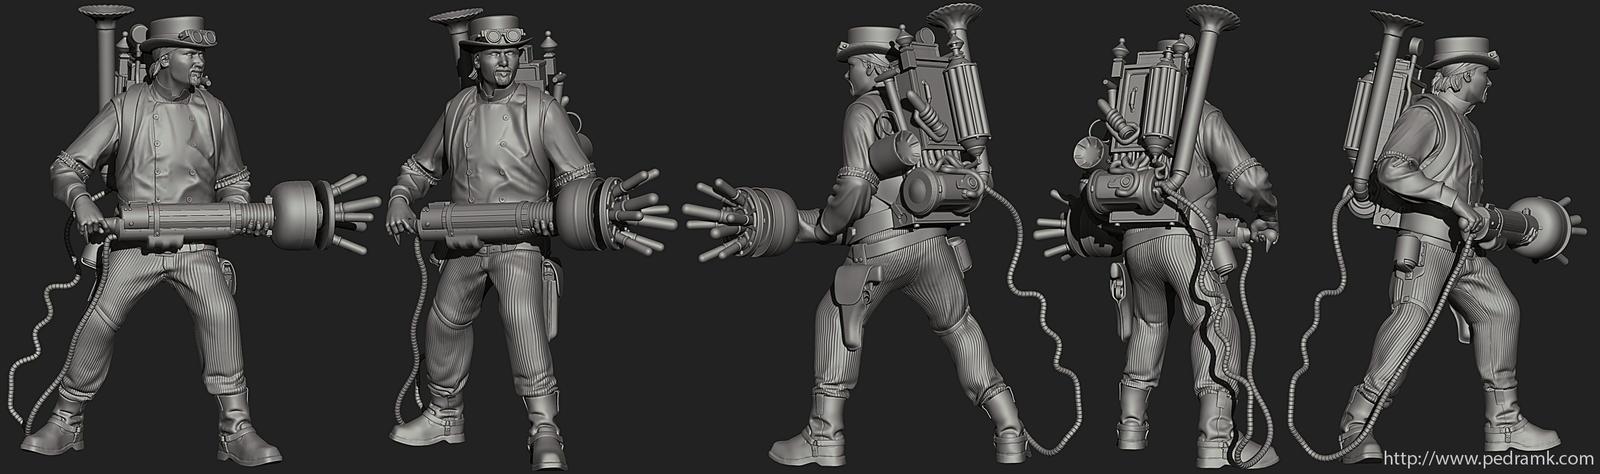 Steampunk Ghostbuster ZBrush by pedramk